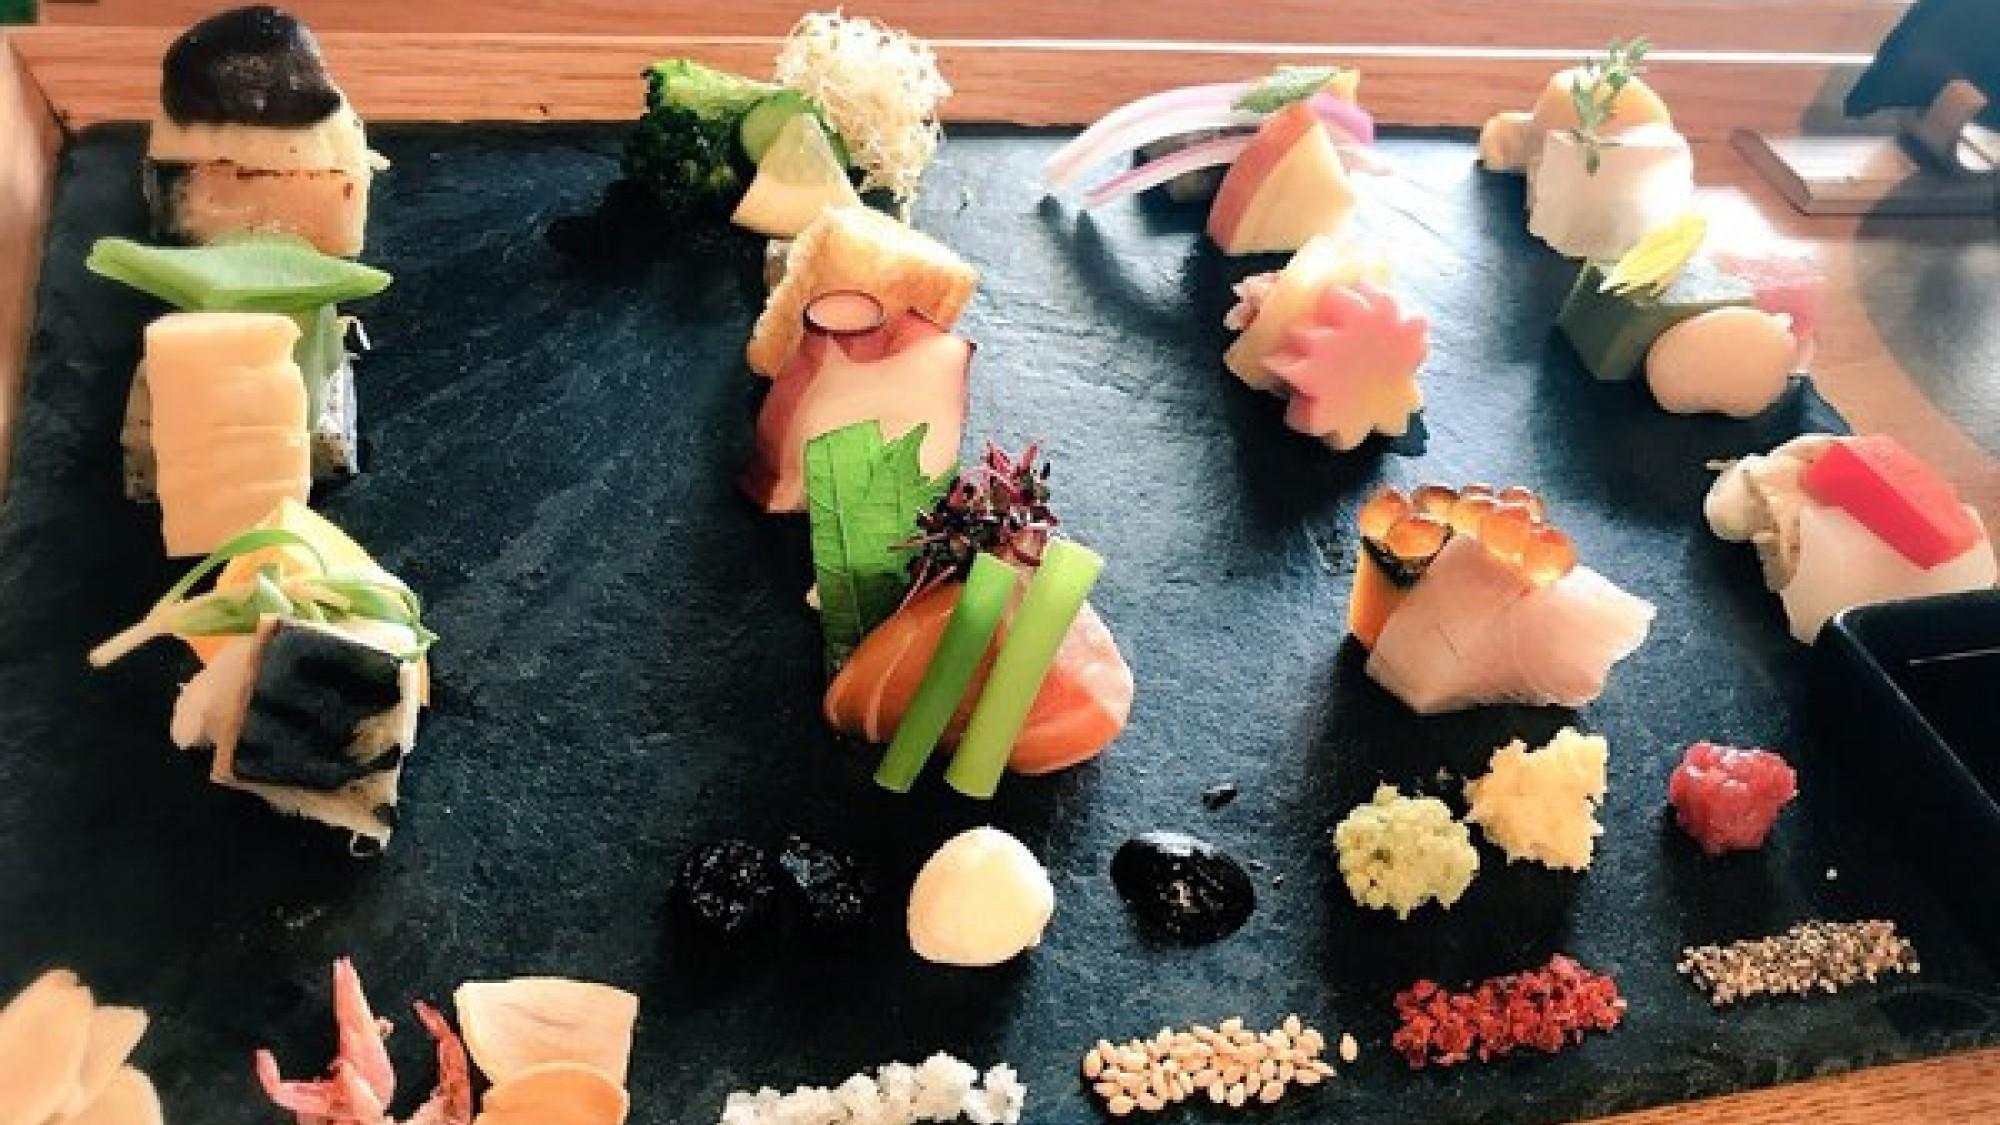 【AWOMB】 予約必須の大人気店。手づくり手織り寿司で楽しくオシャレに♪